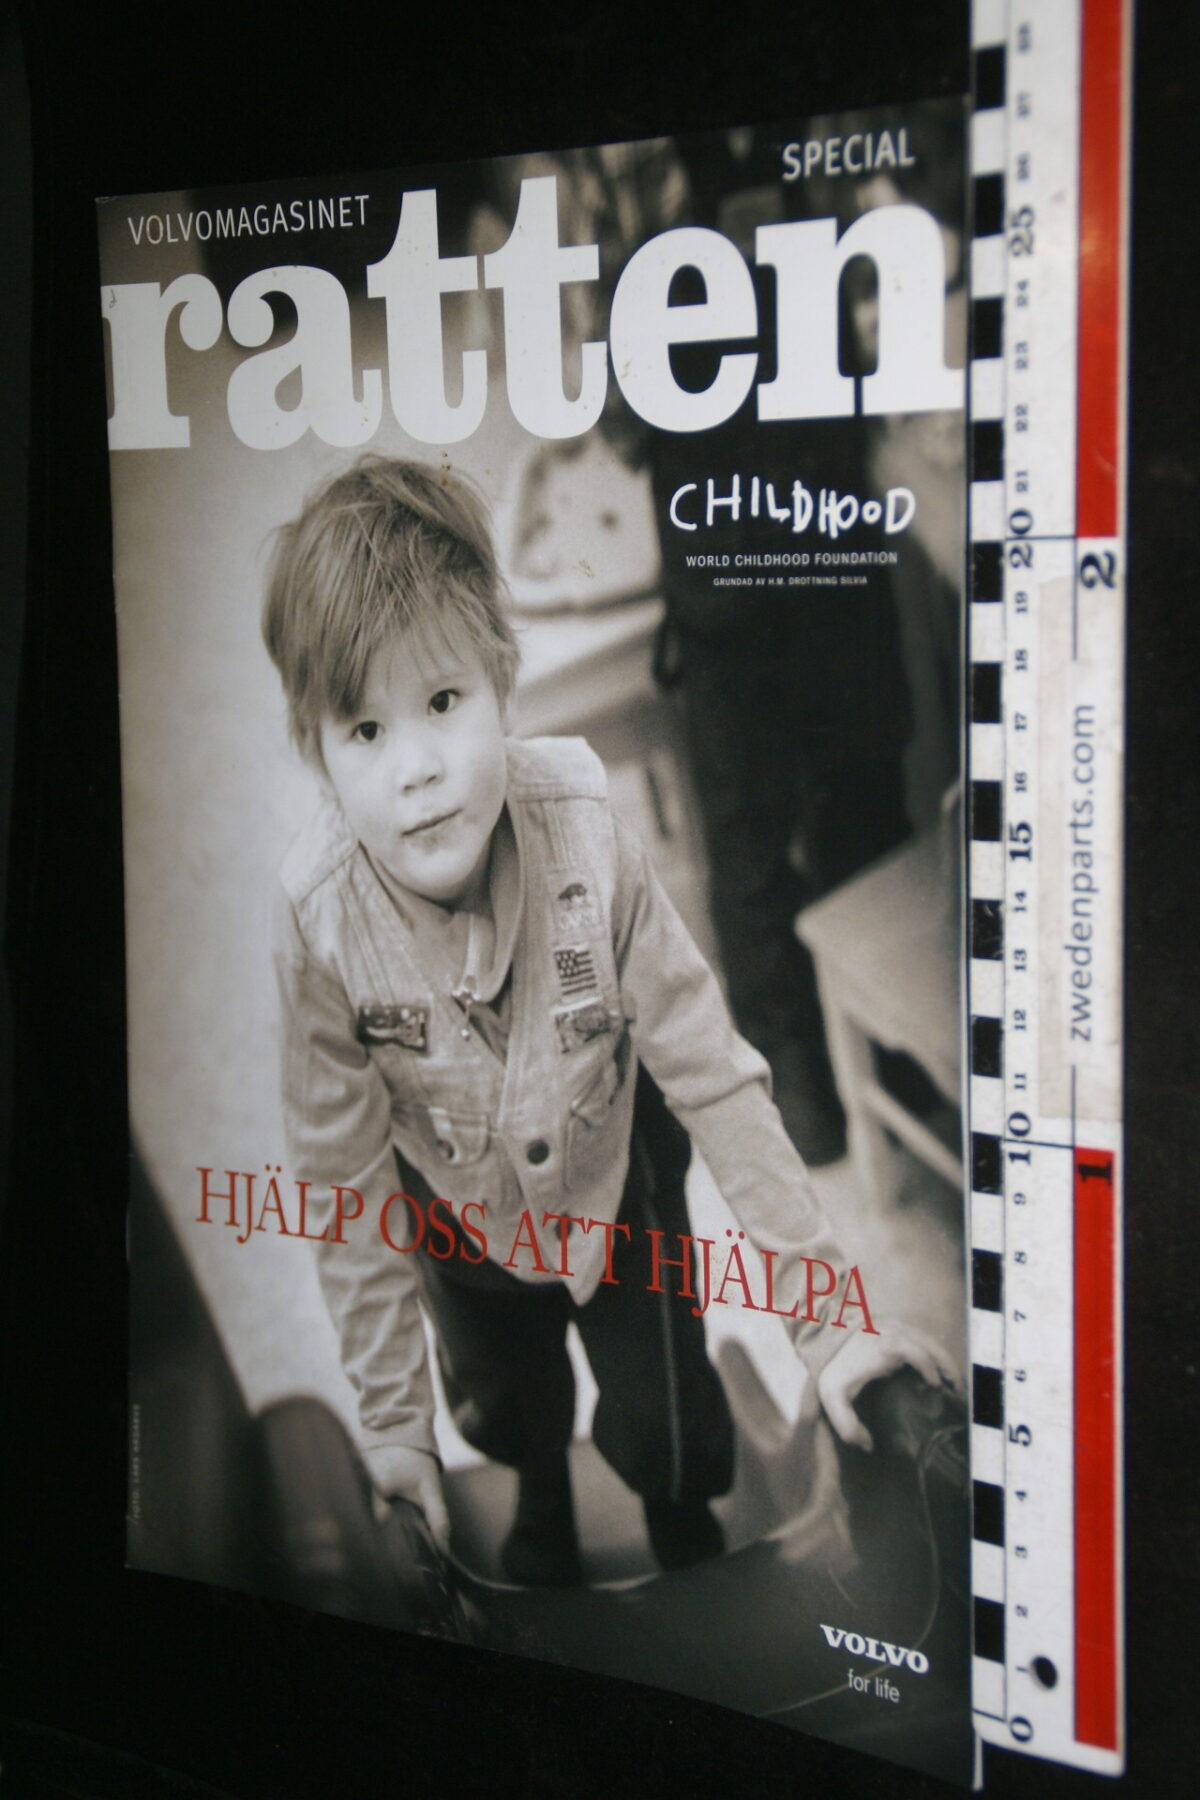 DSC00293 2003 origineel Volvotijdschrift Ratten nr VB-PV 214 Svensk-6ce09ab3